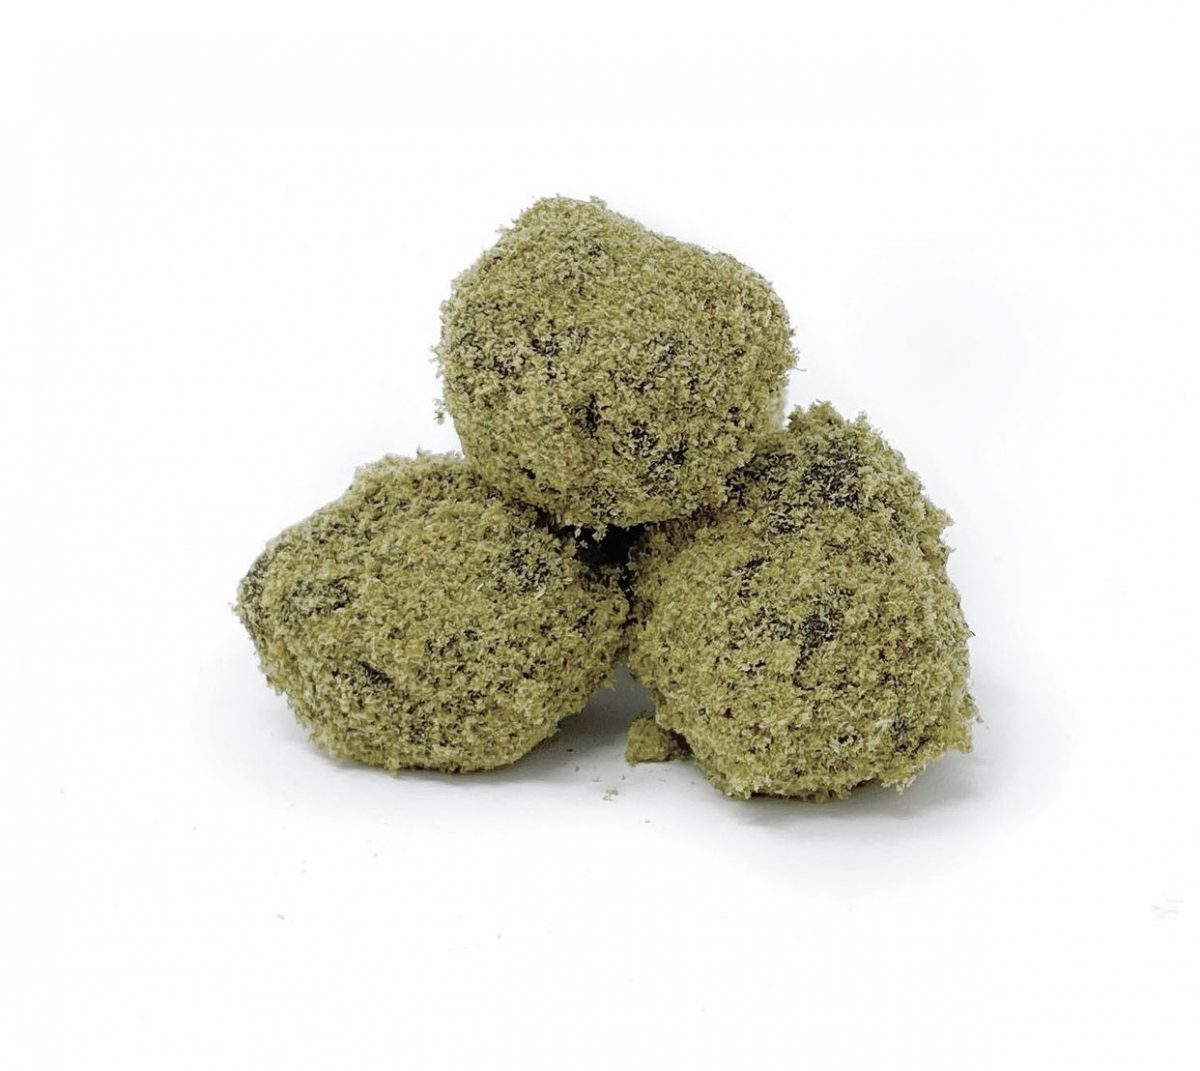 Buy Sour Moon Rocks Online